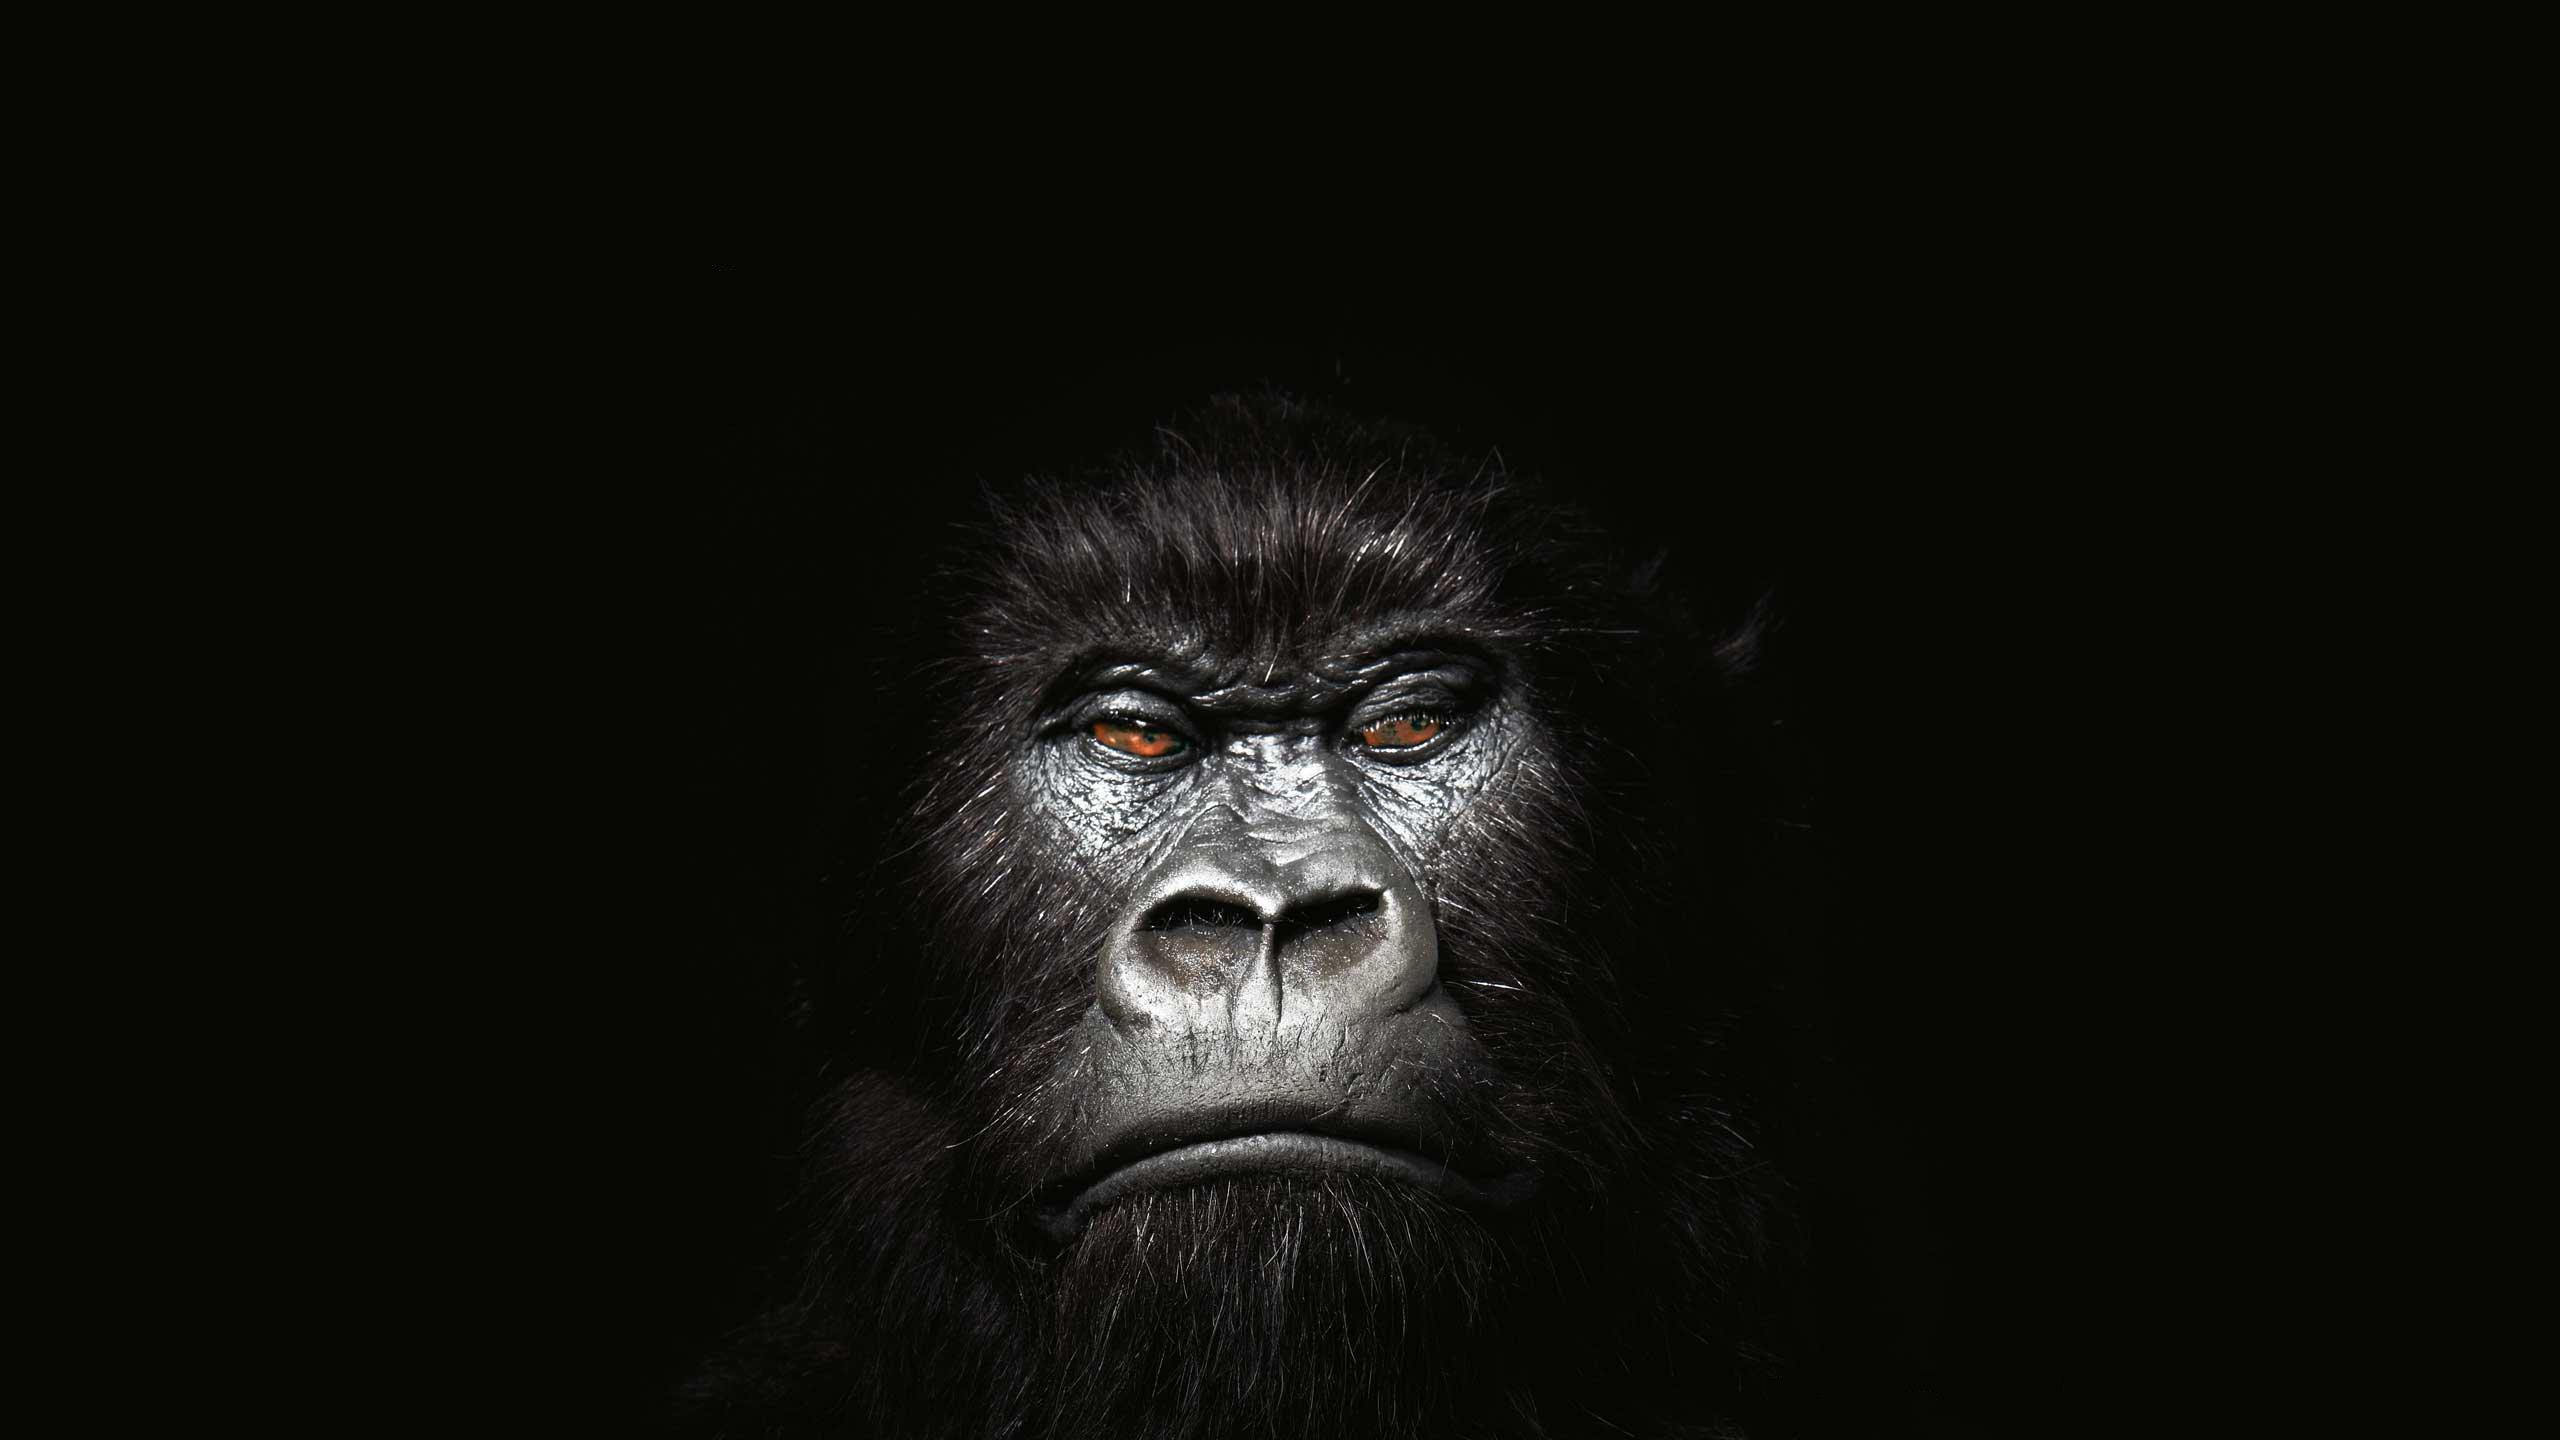 Gorilla Co